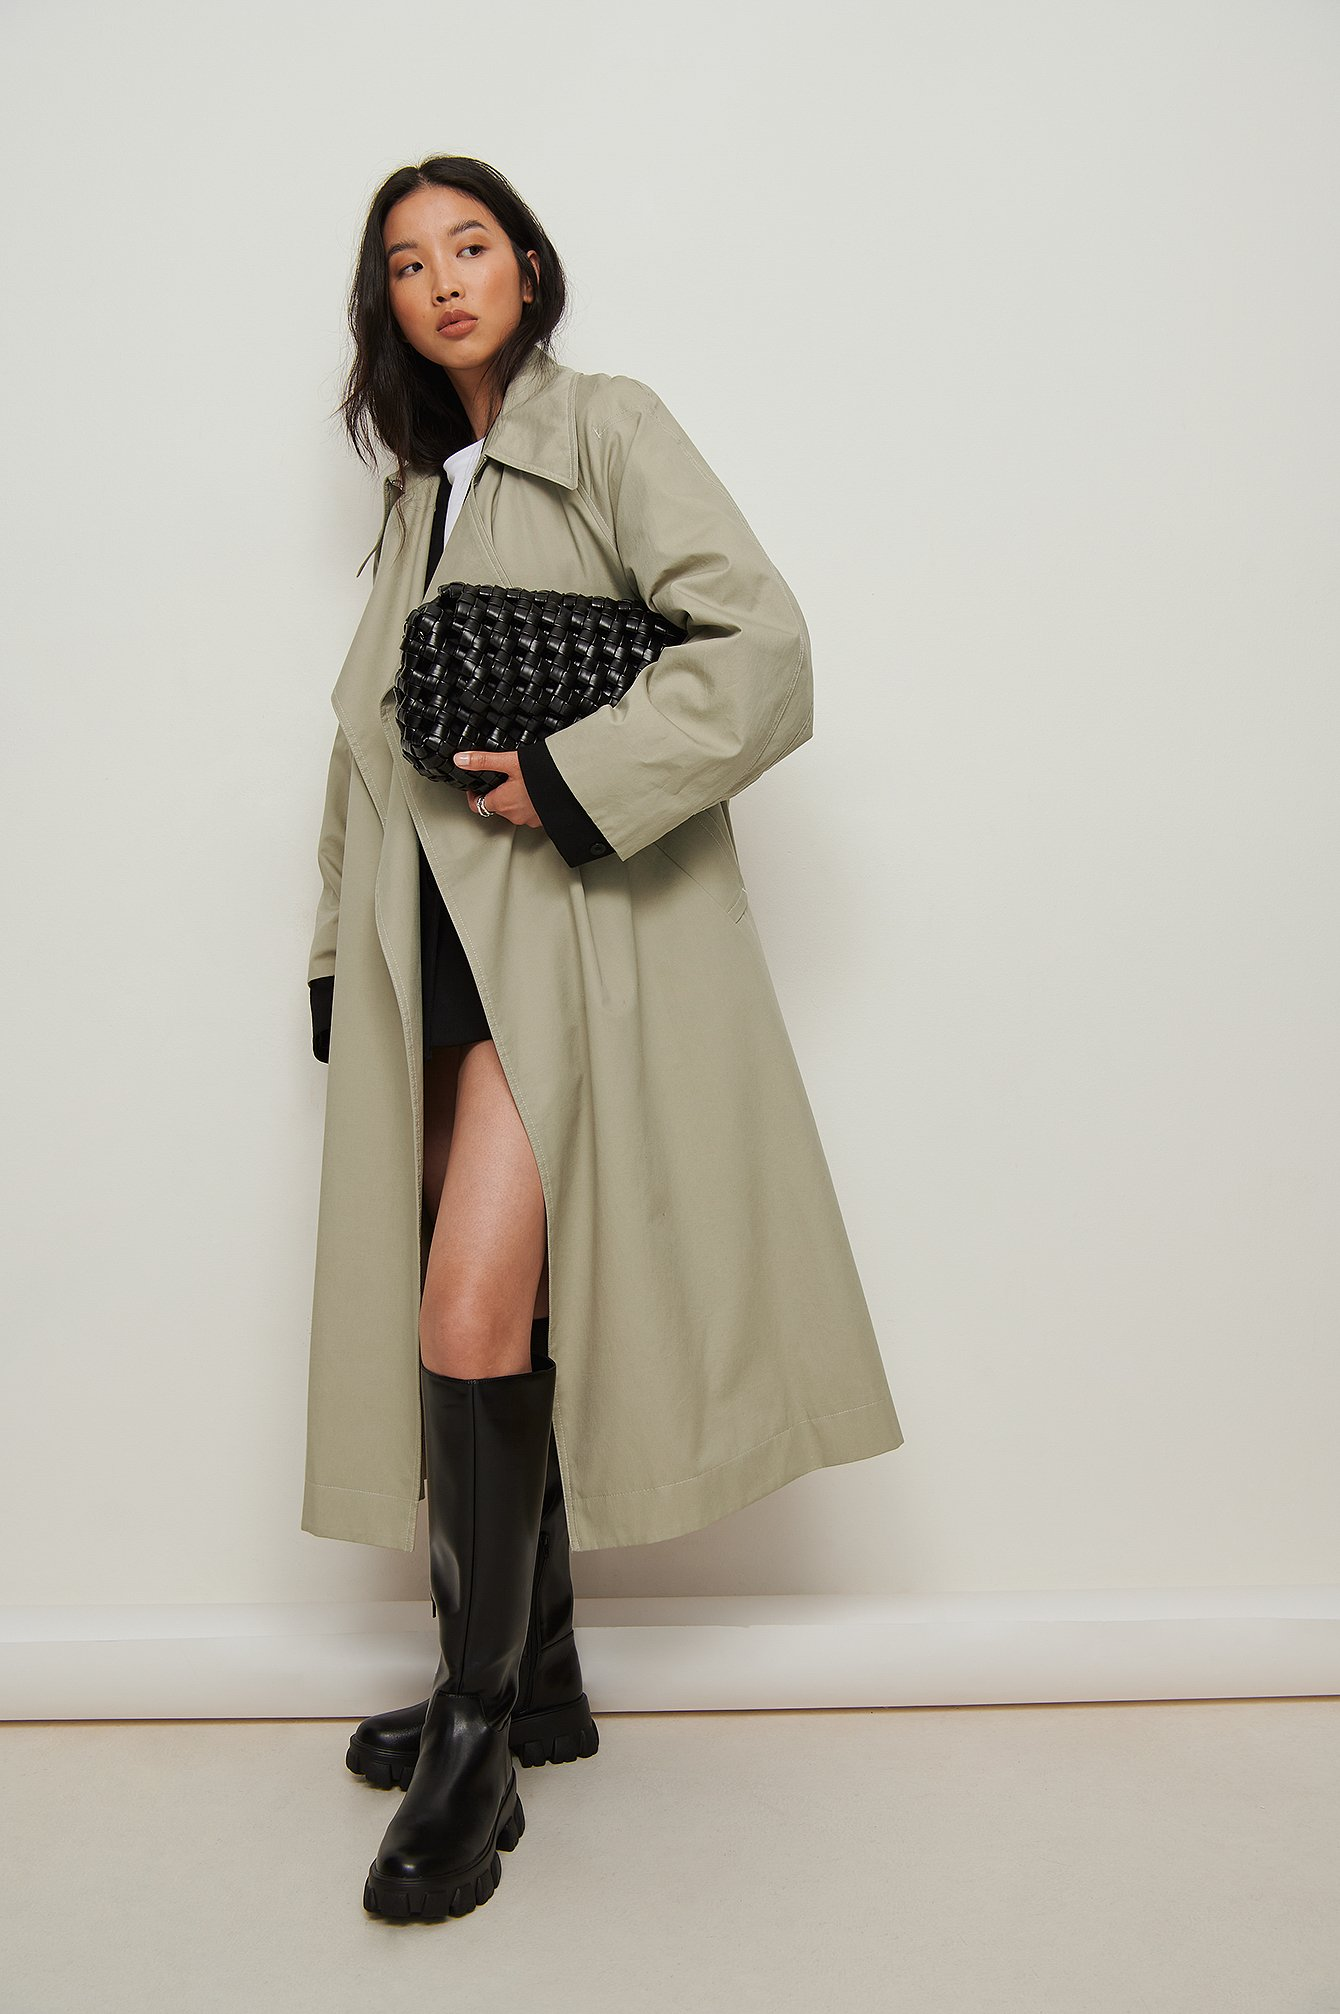 na-kd shoes -  Recycelte Schaft-Stiefel Mit Profil-Sohle - Black